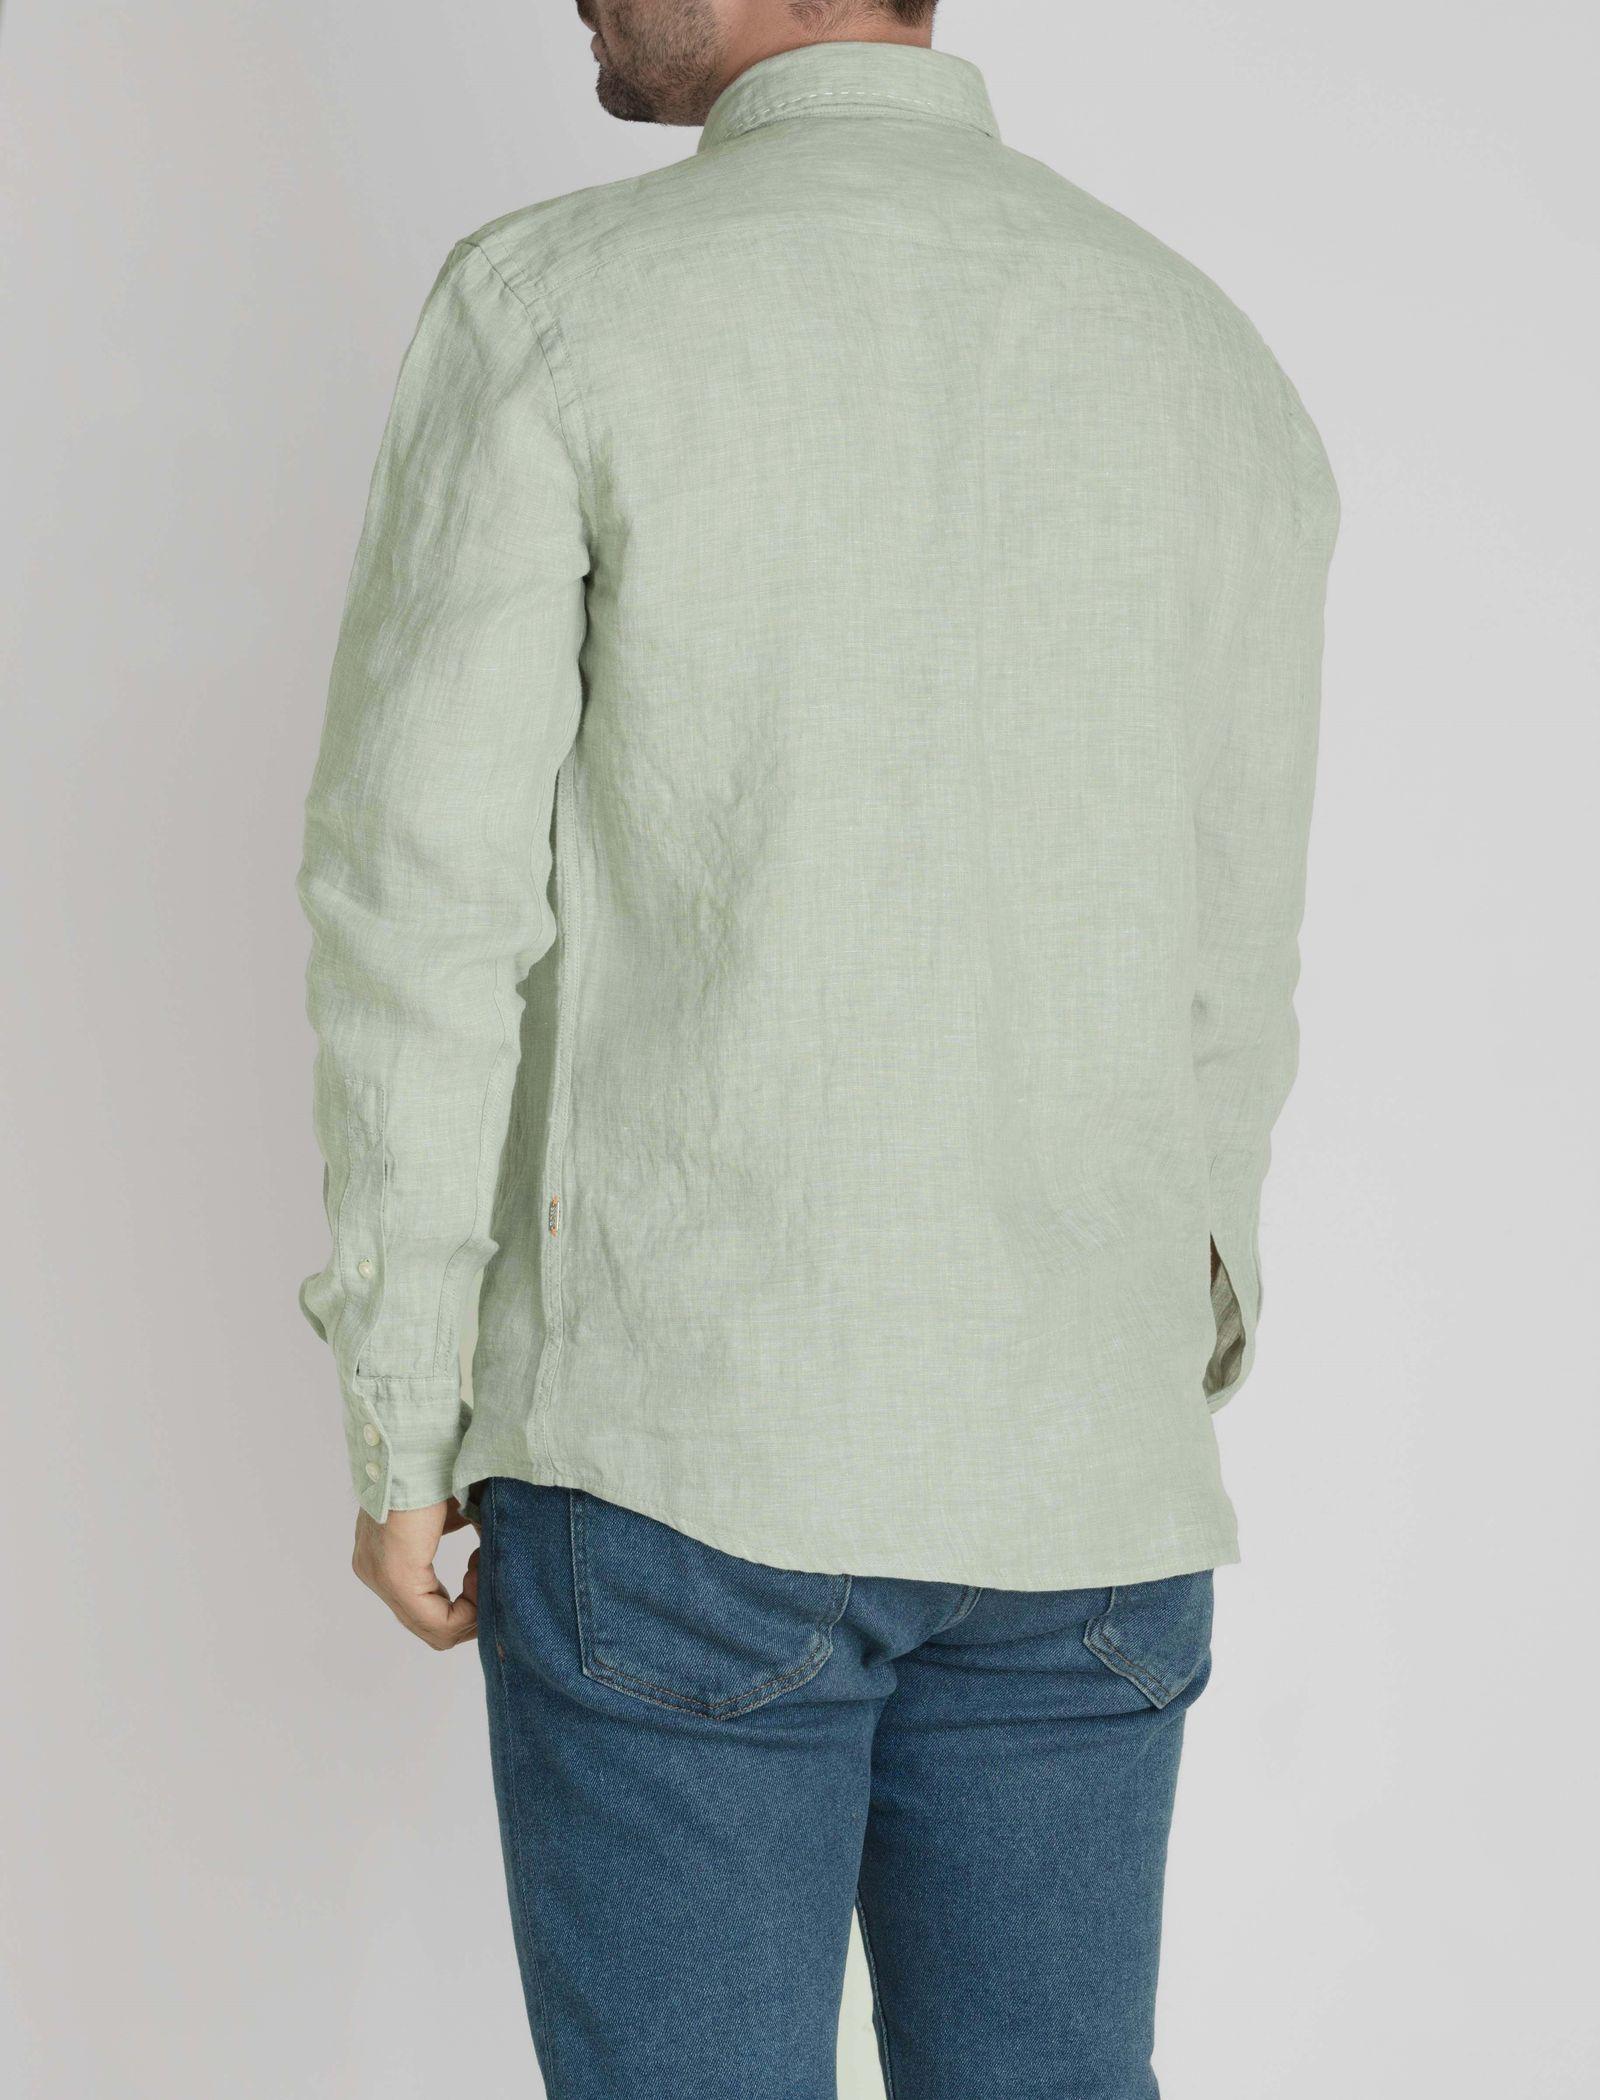 پیراهن آستین بلند مردانه Classy_1 - باس اورنج - سبز روشن  - 5